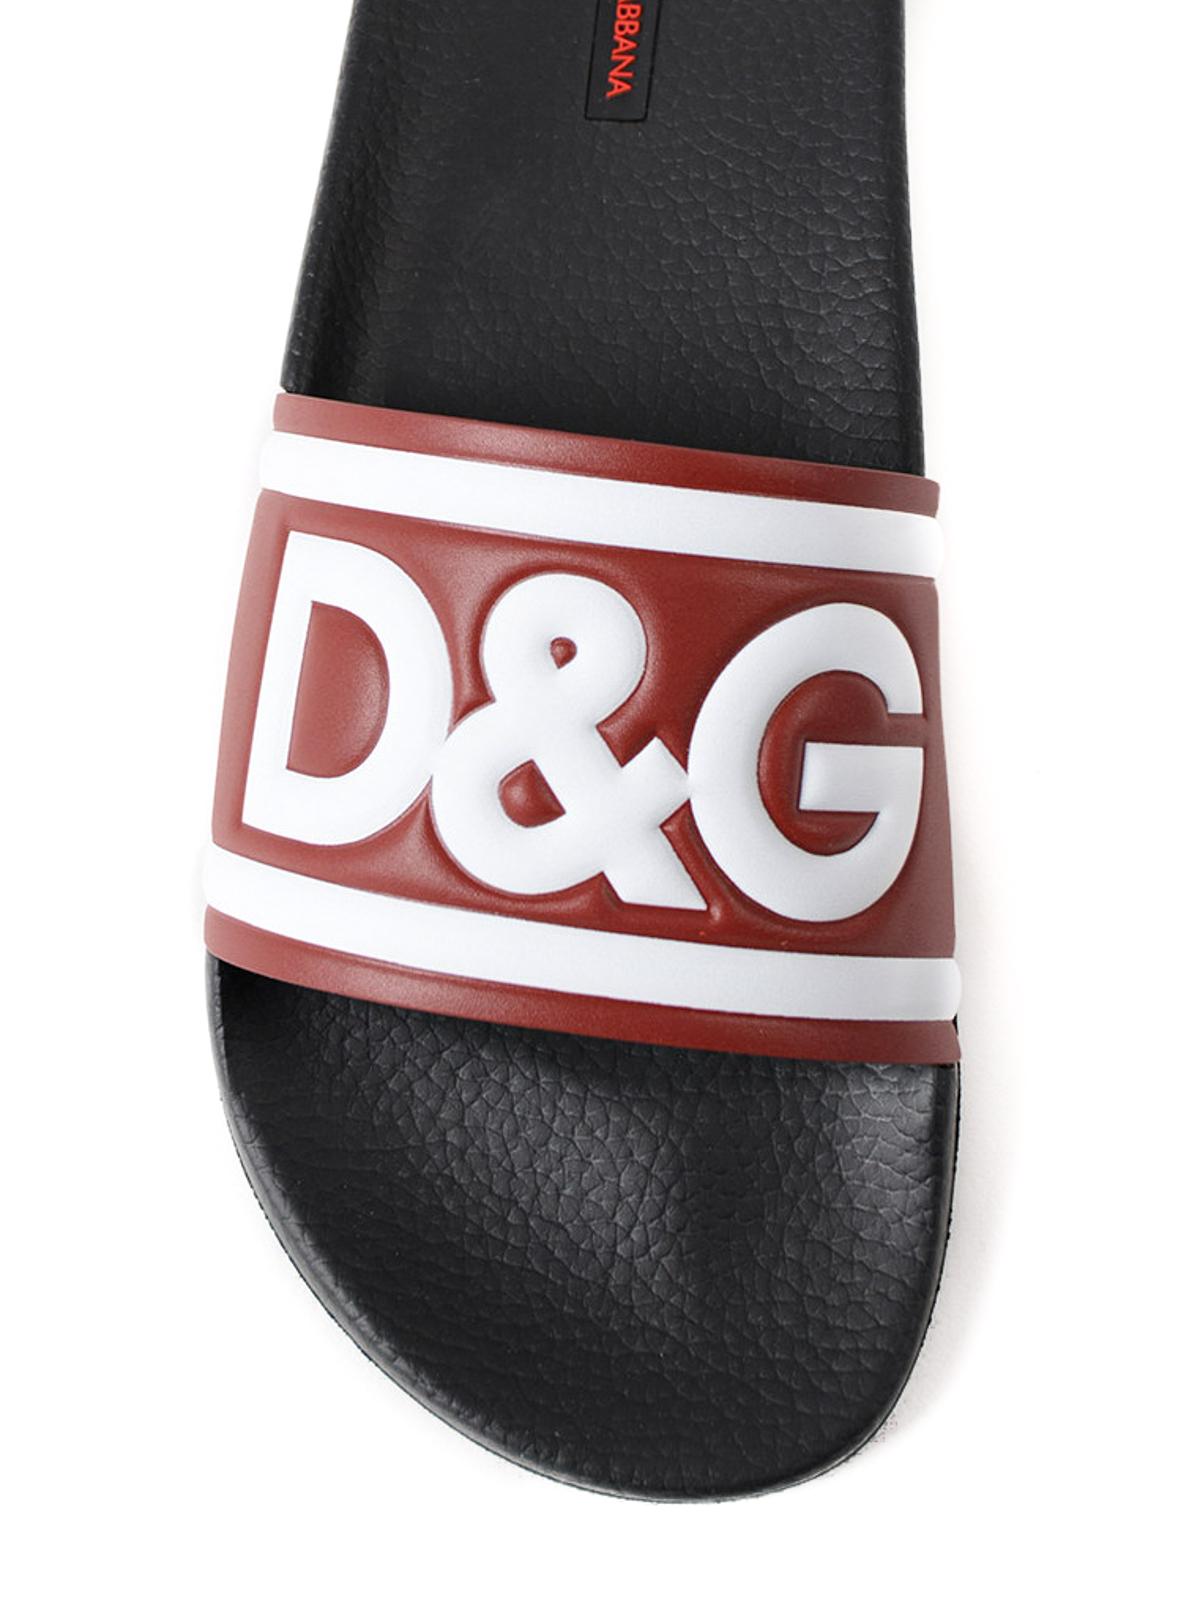 a89b4d7bff Dolce & Gabbana - Slides in pelle rossa con logo - sandali ...